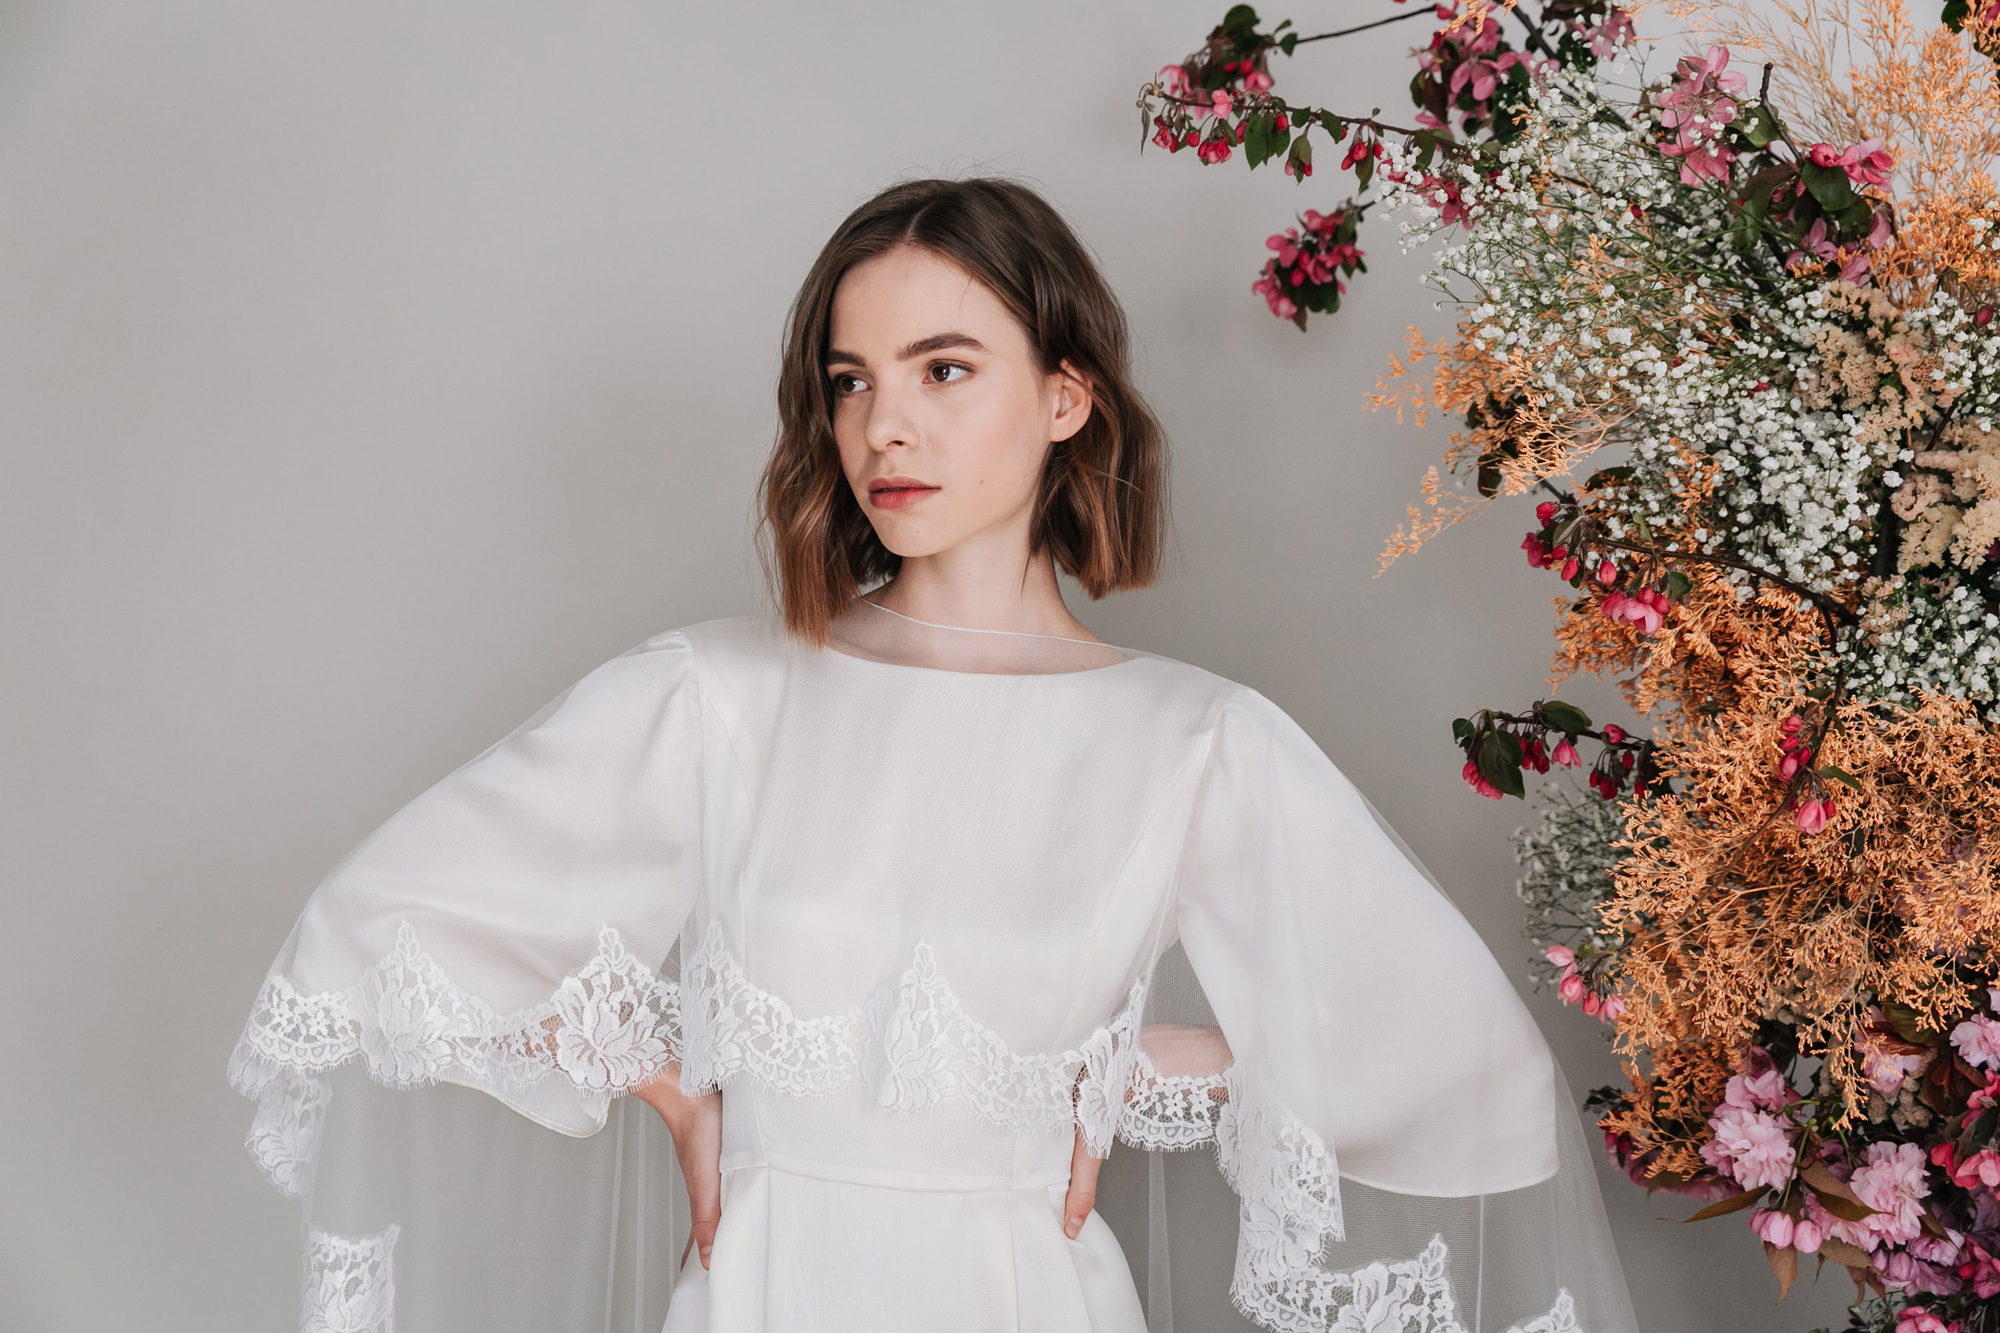 Kate-Beaumont-Lunaria-Bohemian-Hammered-Silk-Wedding-Dress-Sleeves-19.jpg